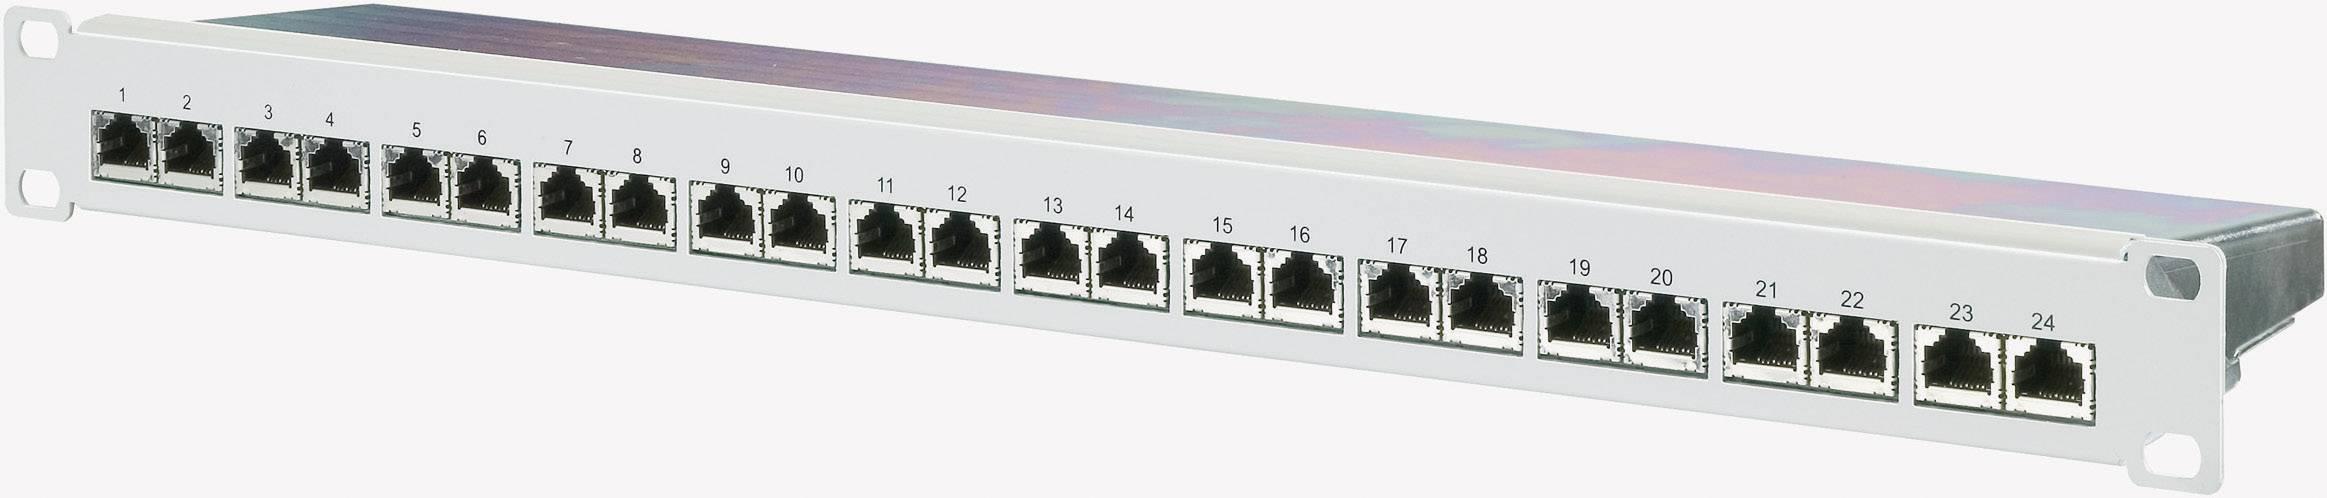 Sieťový patchpanel